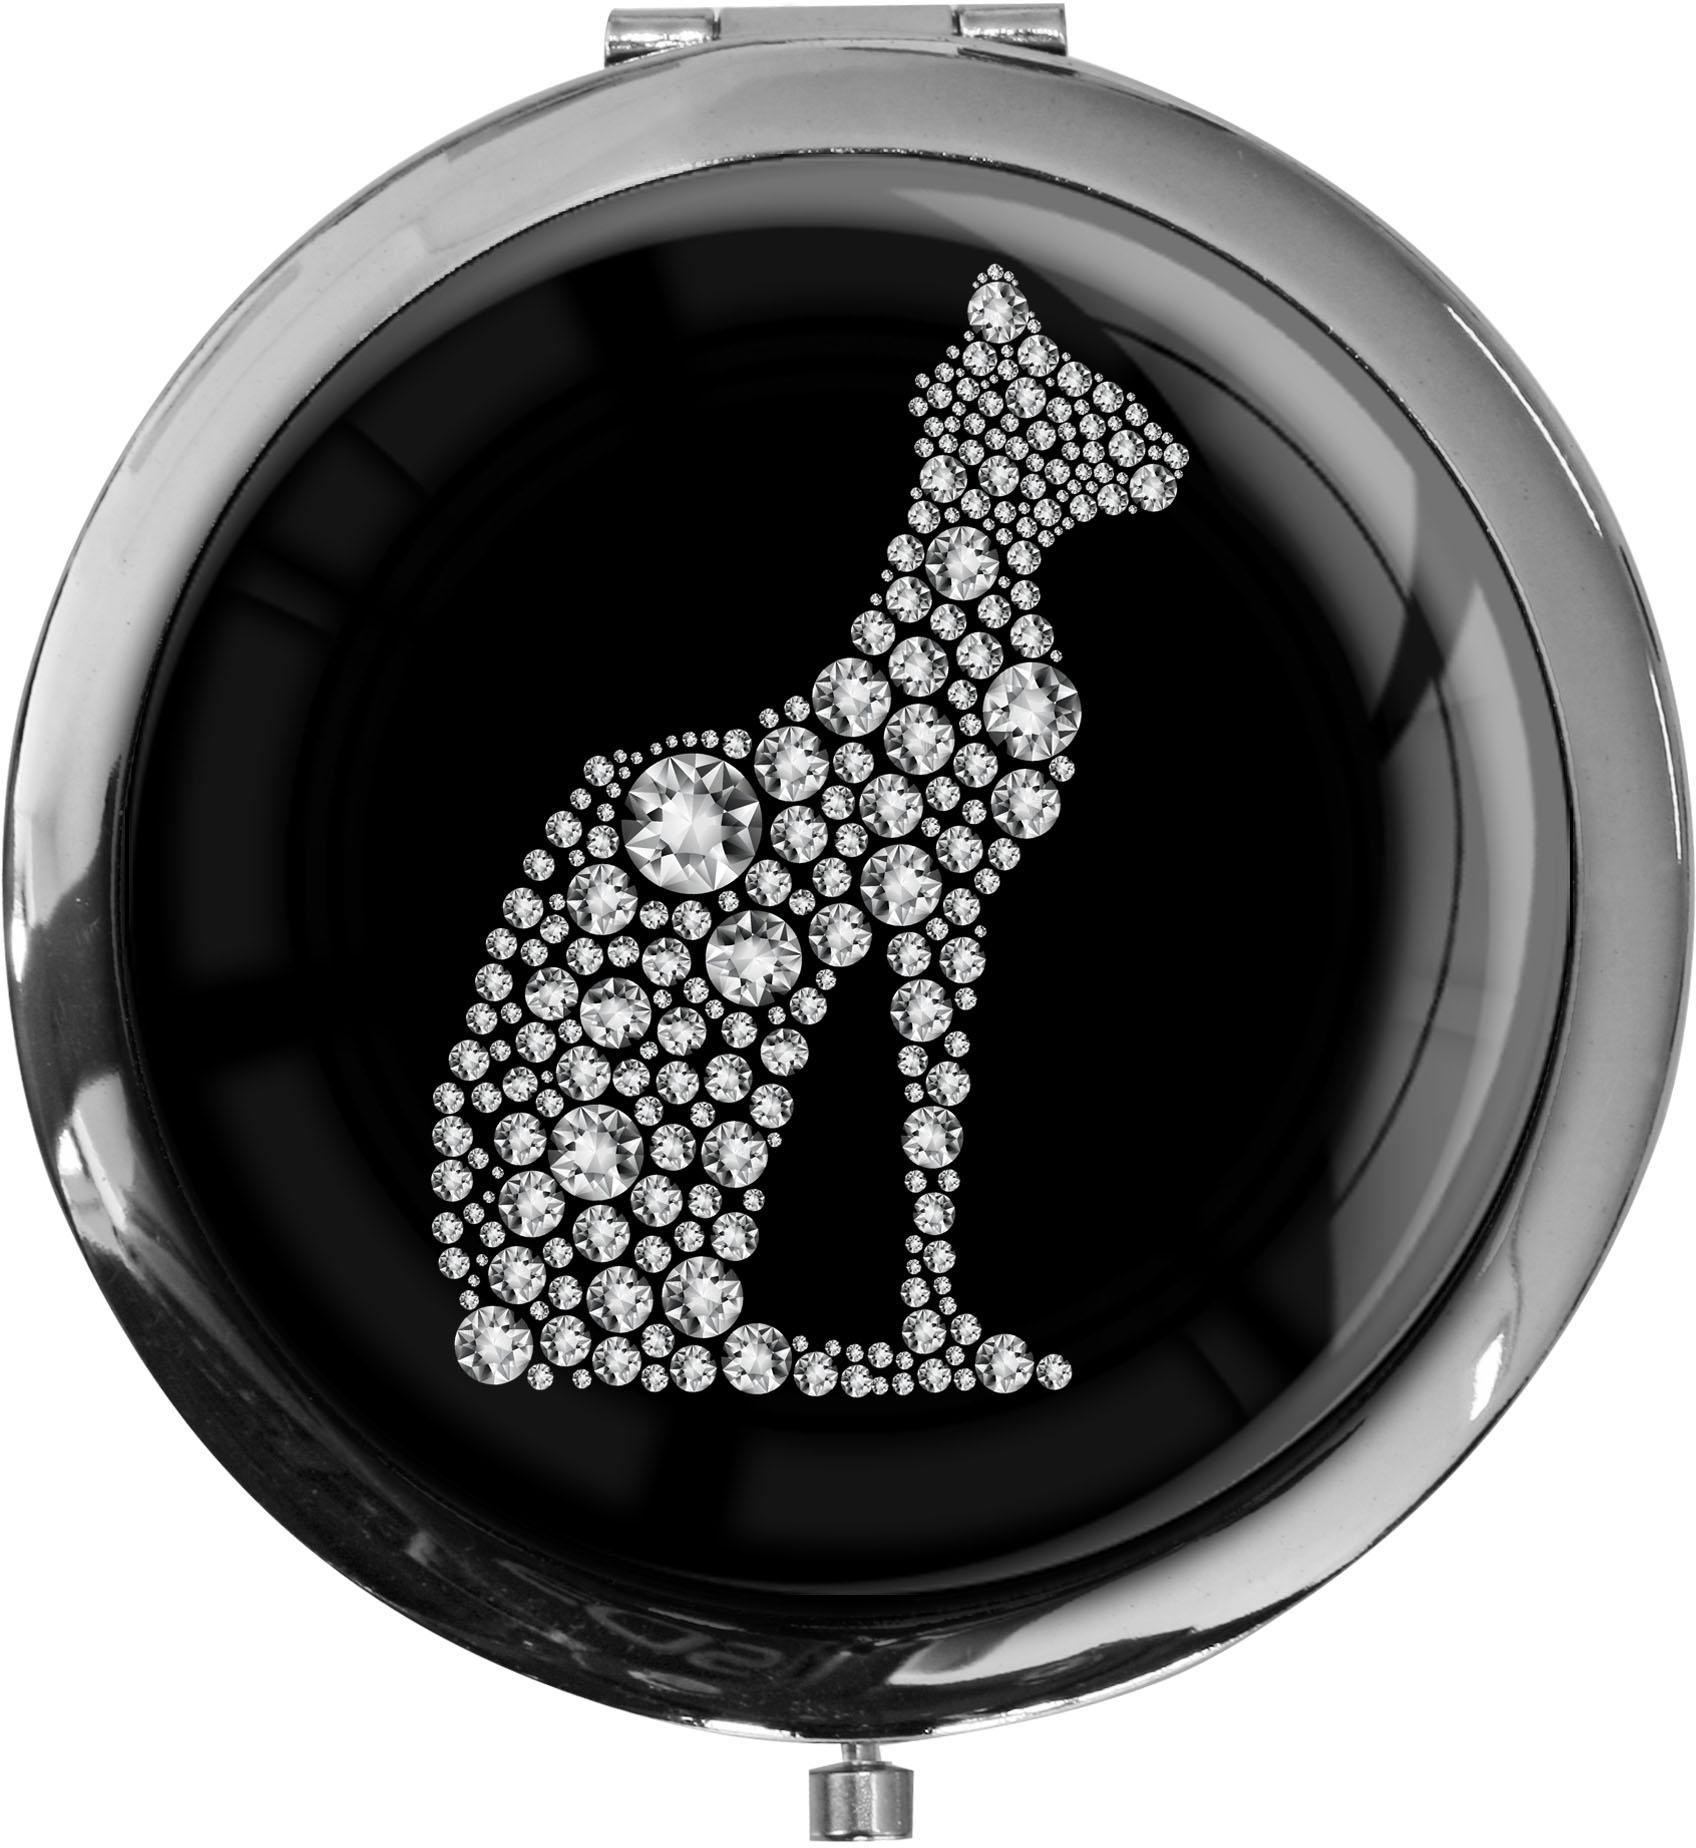 "metALUm - Extragroße Pillendose in runder Form ""Katze in Silber"""